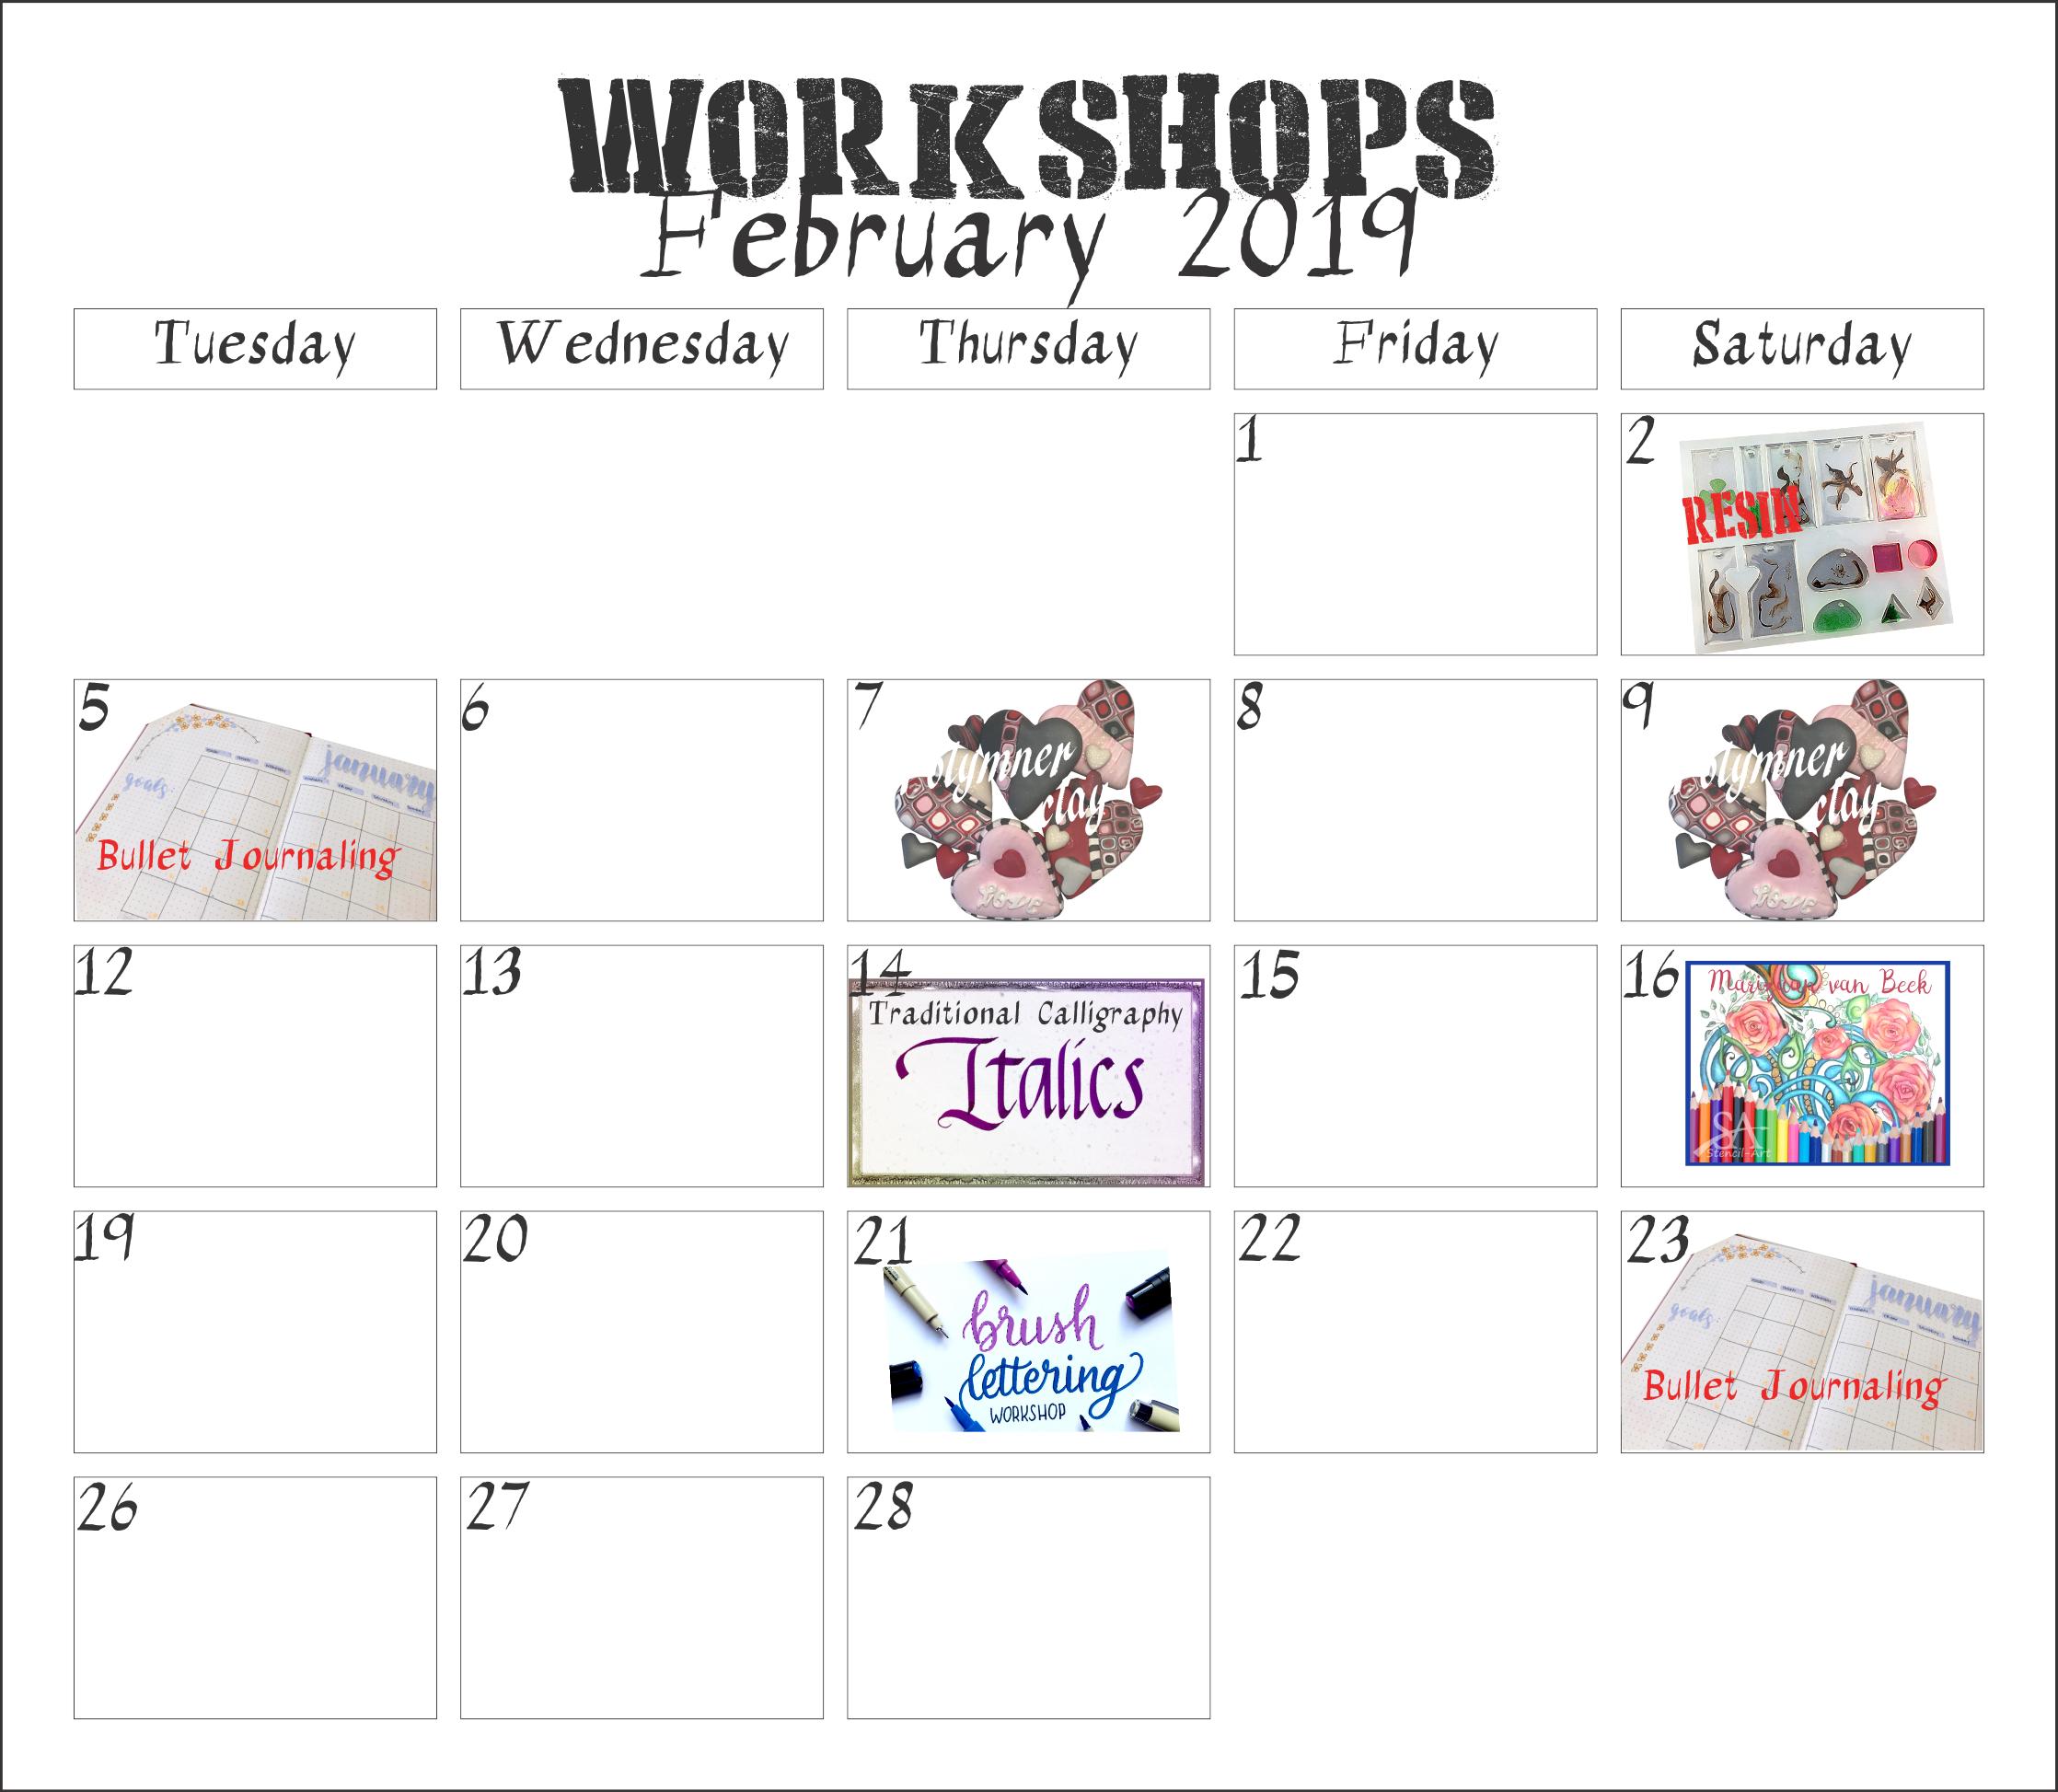 workshops-schedule-feb-2019-final.png